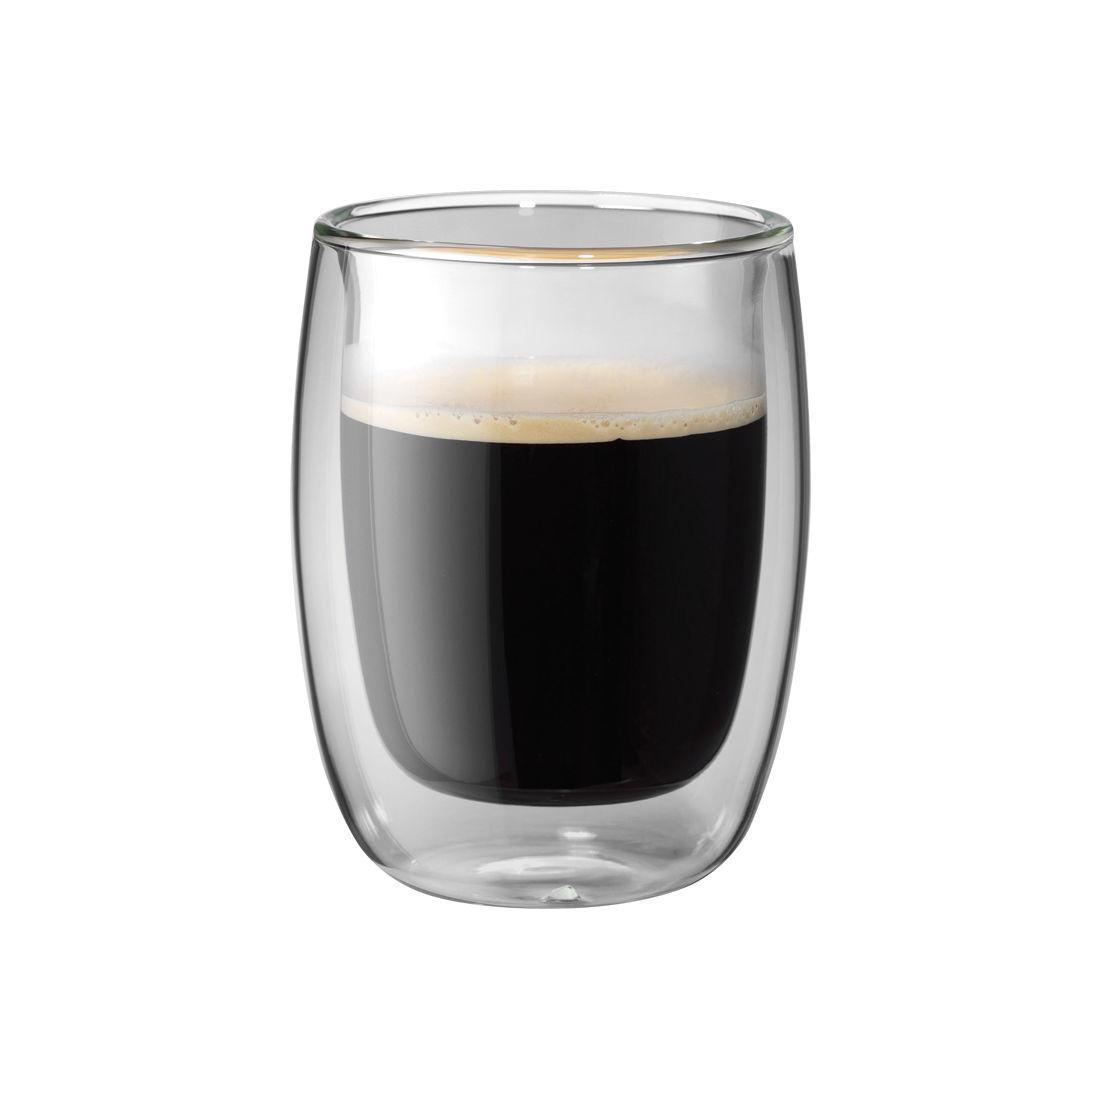 Sorrento 2-Piece 200ml Double Wall Coffee Americano Glass